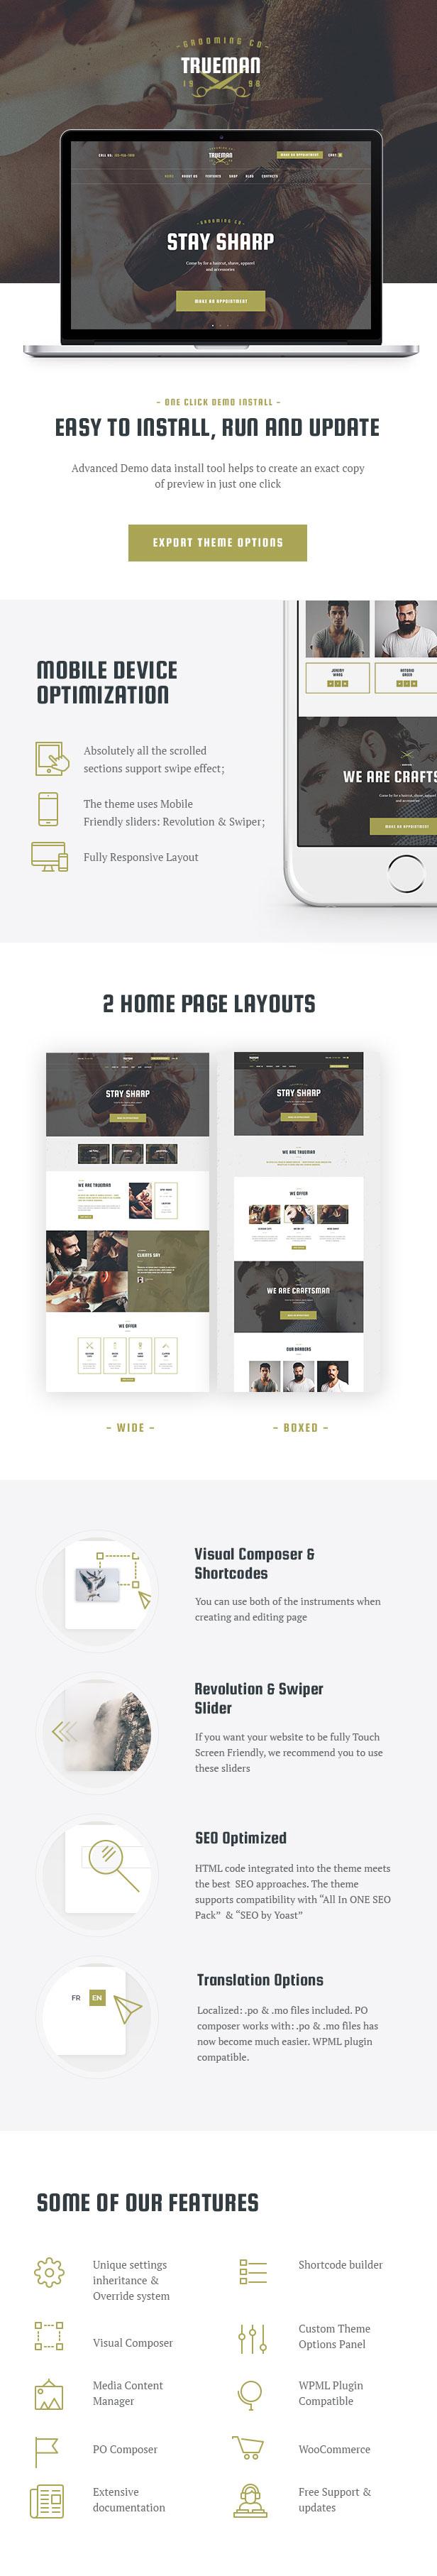 Hairdressers & Barbershop WordPress Theme features